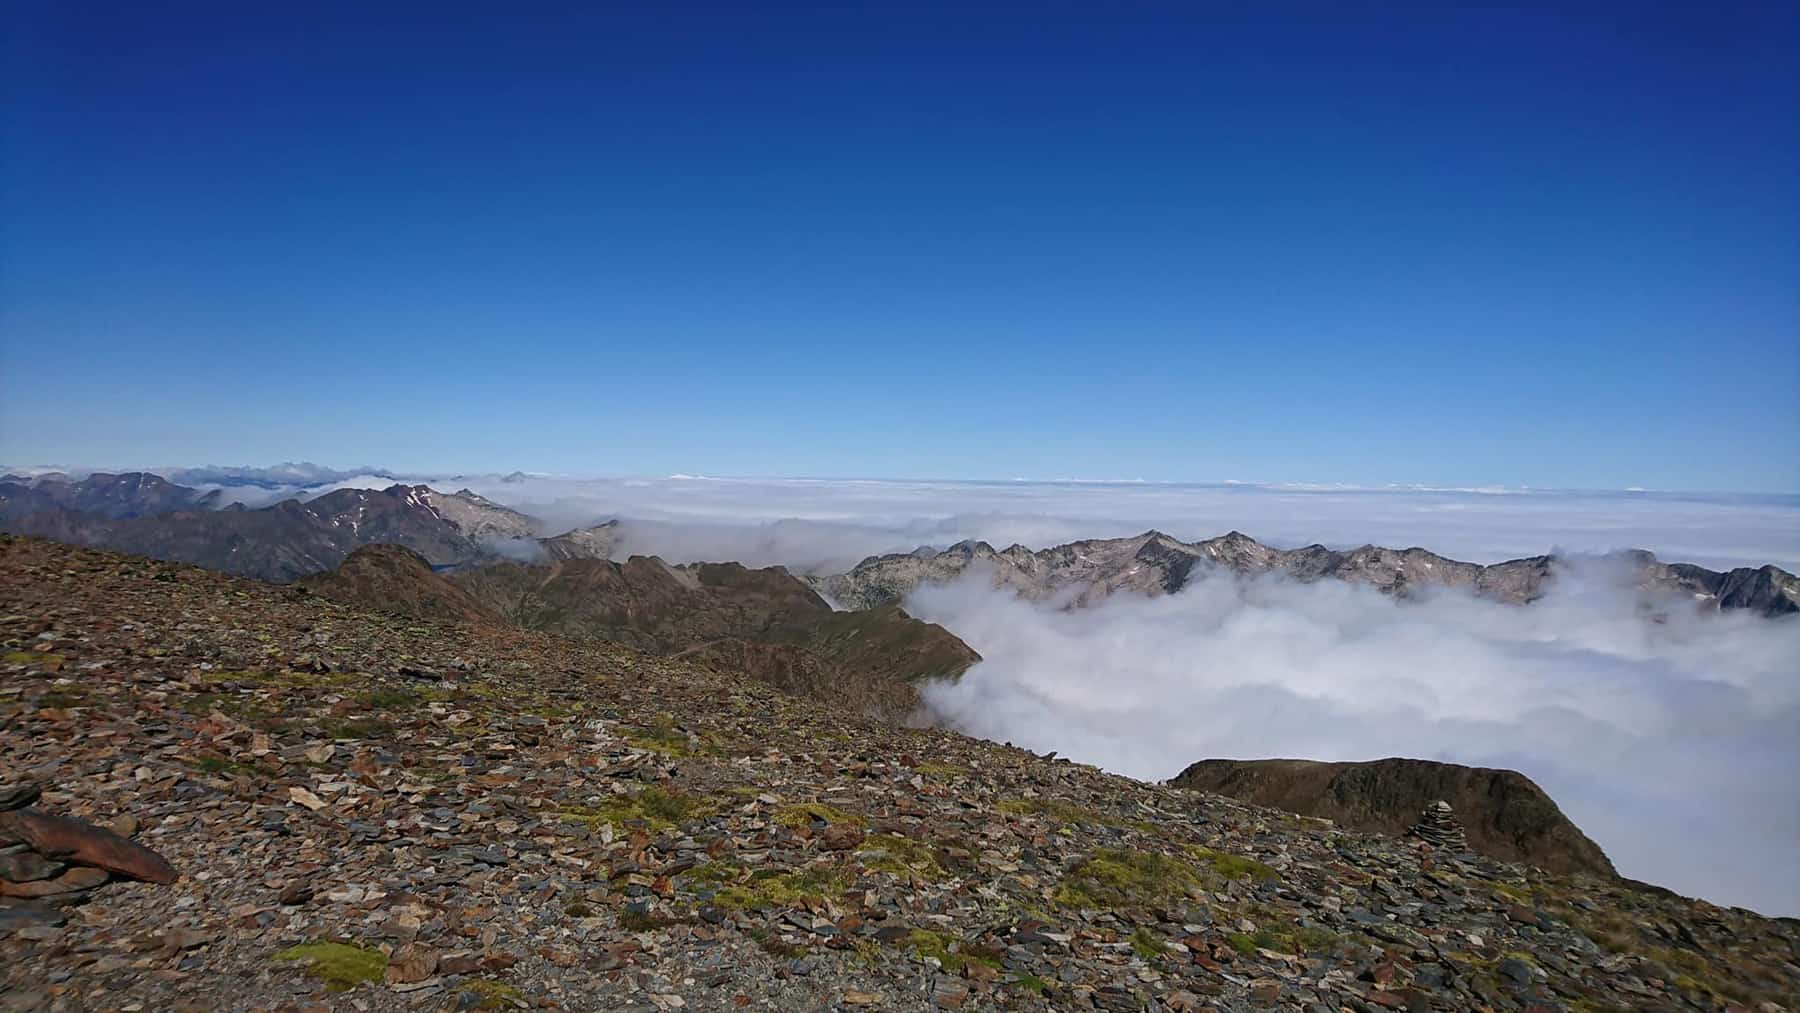 Field Report: Montcalm PHOTO-21